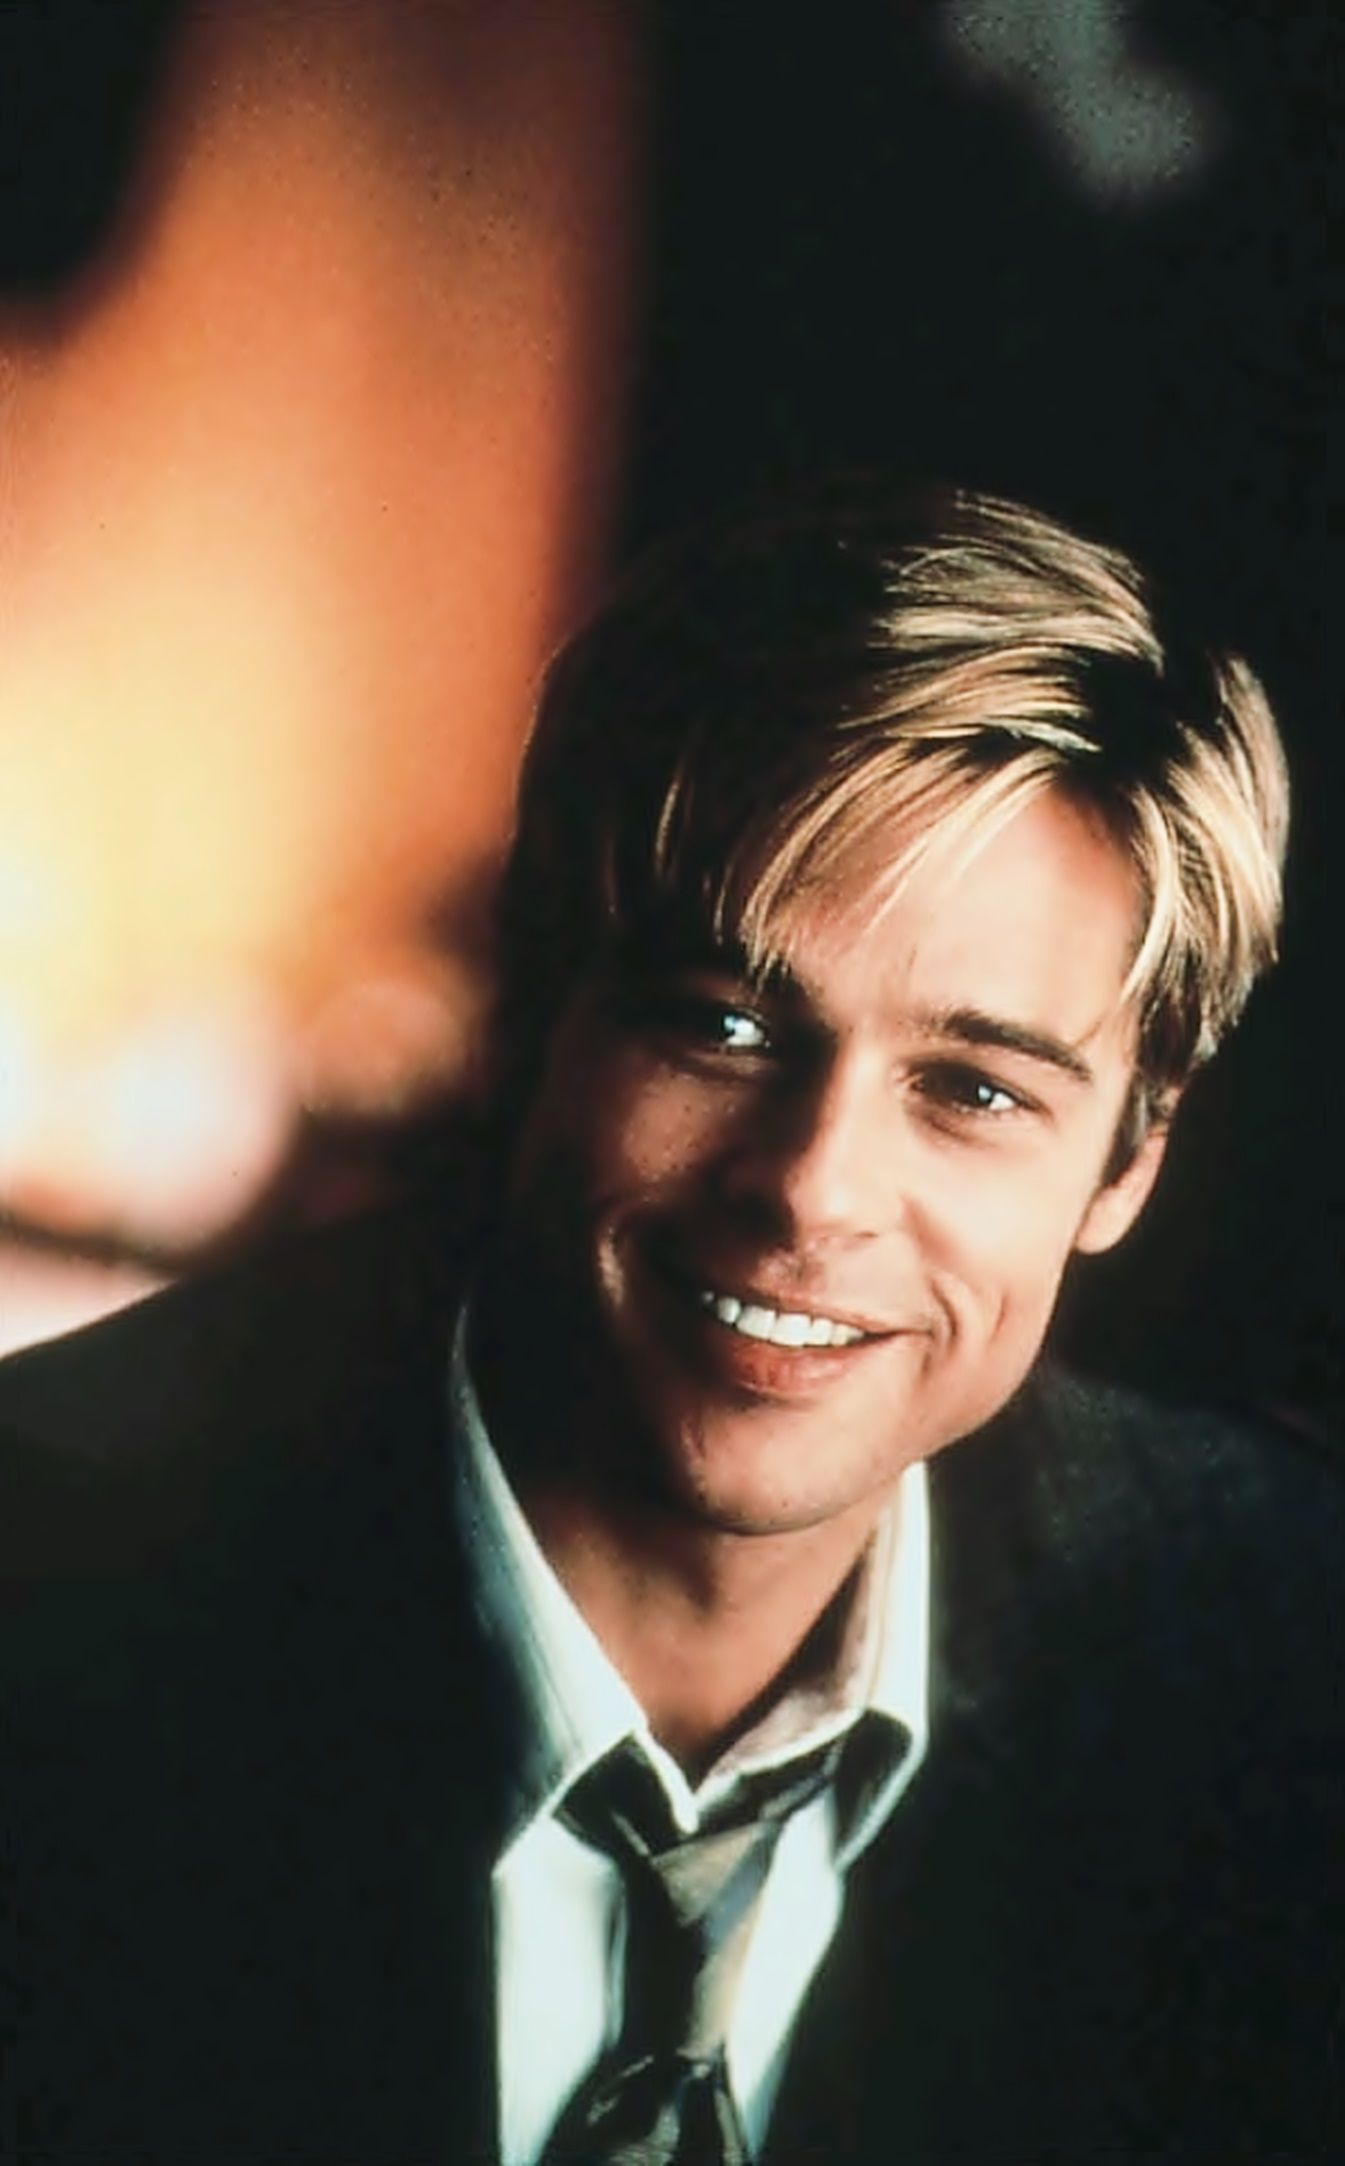 Hot Wallpaper Brad Pitt Meet Joe Black Wallpapers Brad Pitt Brad Pitt Hair Actors